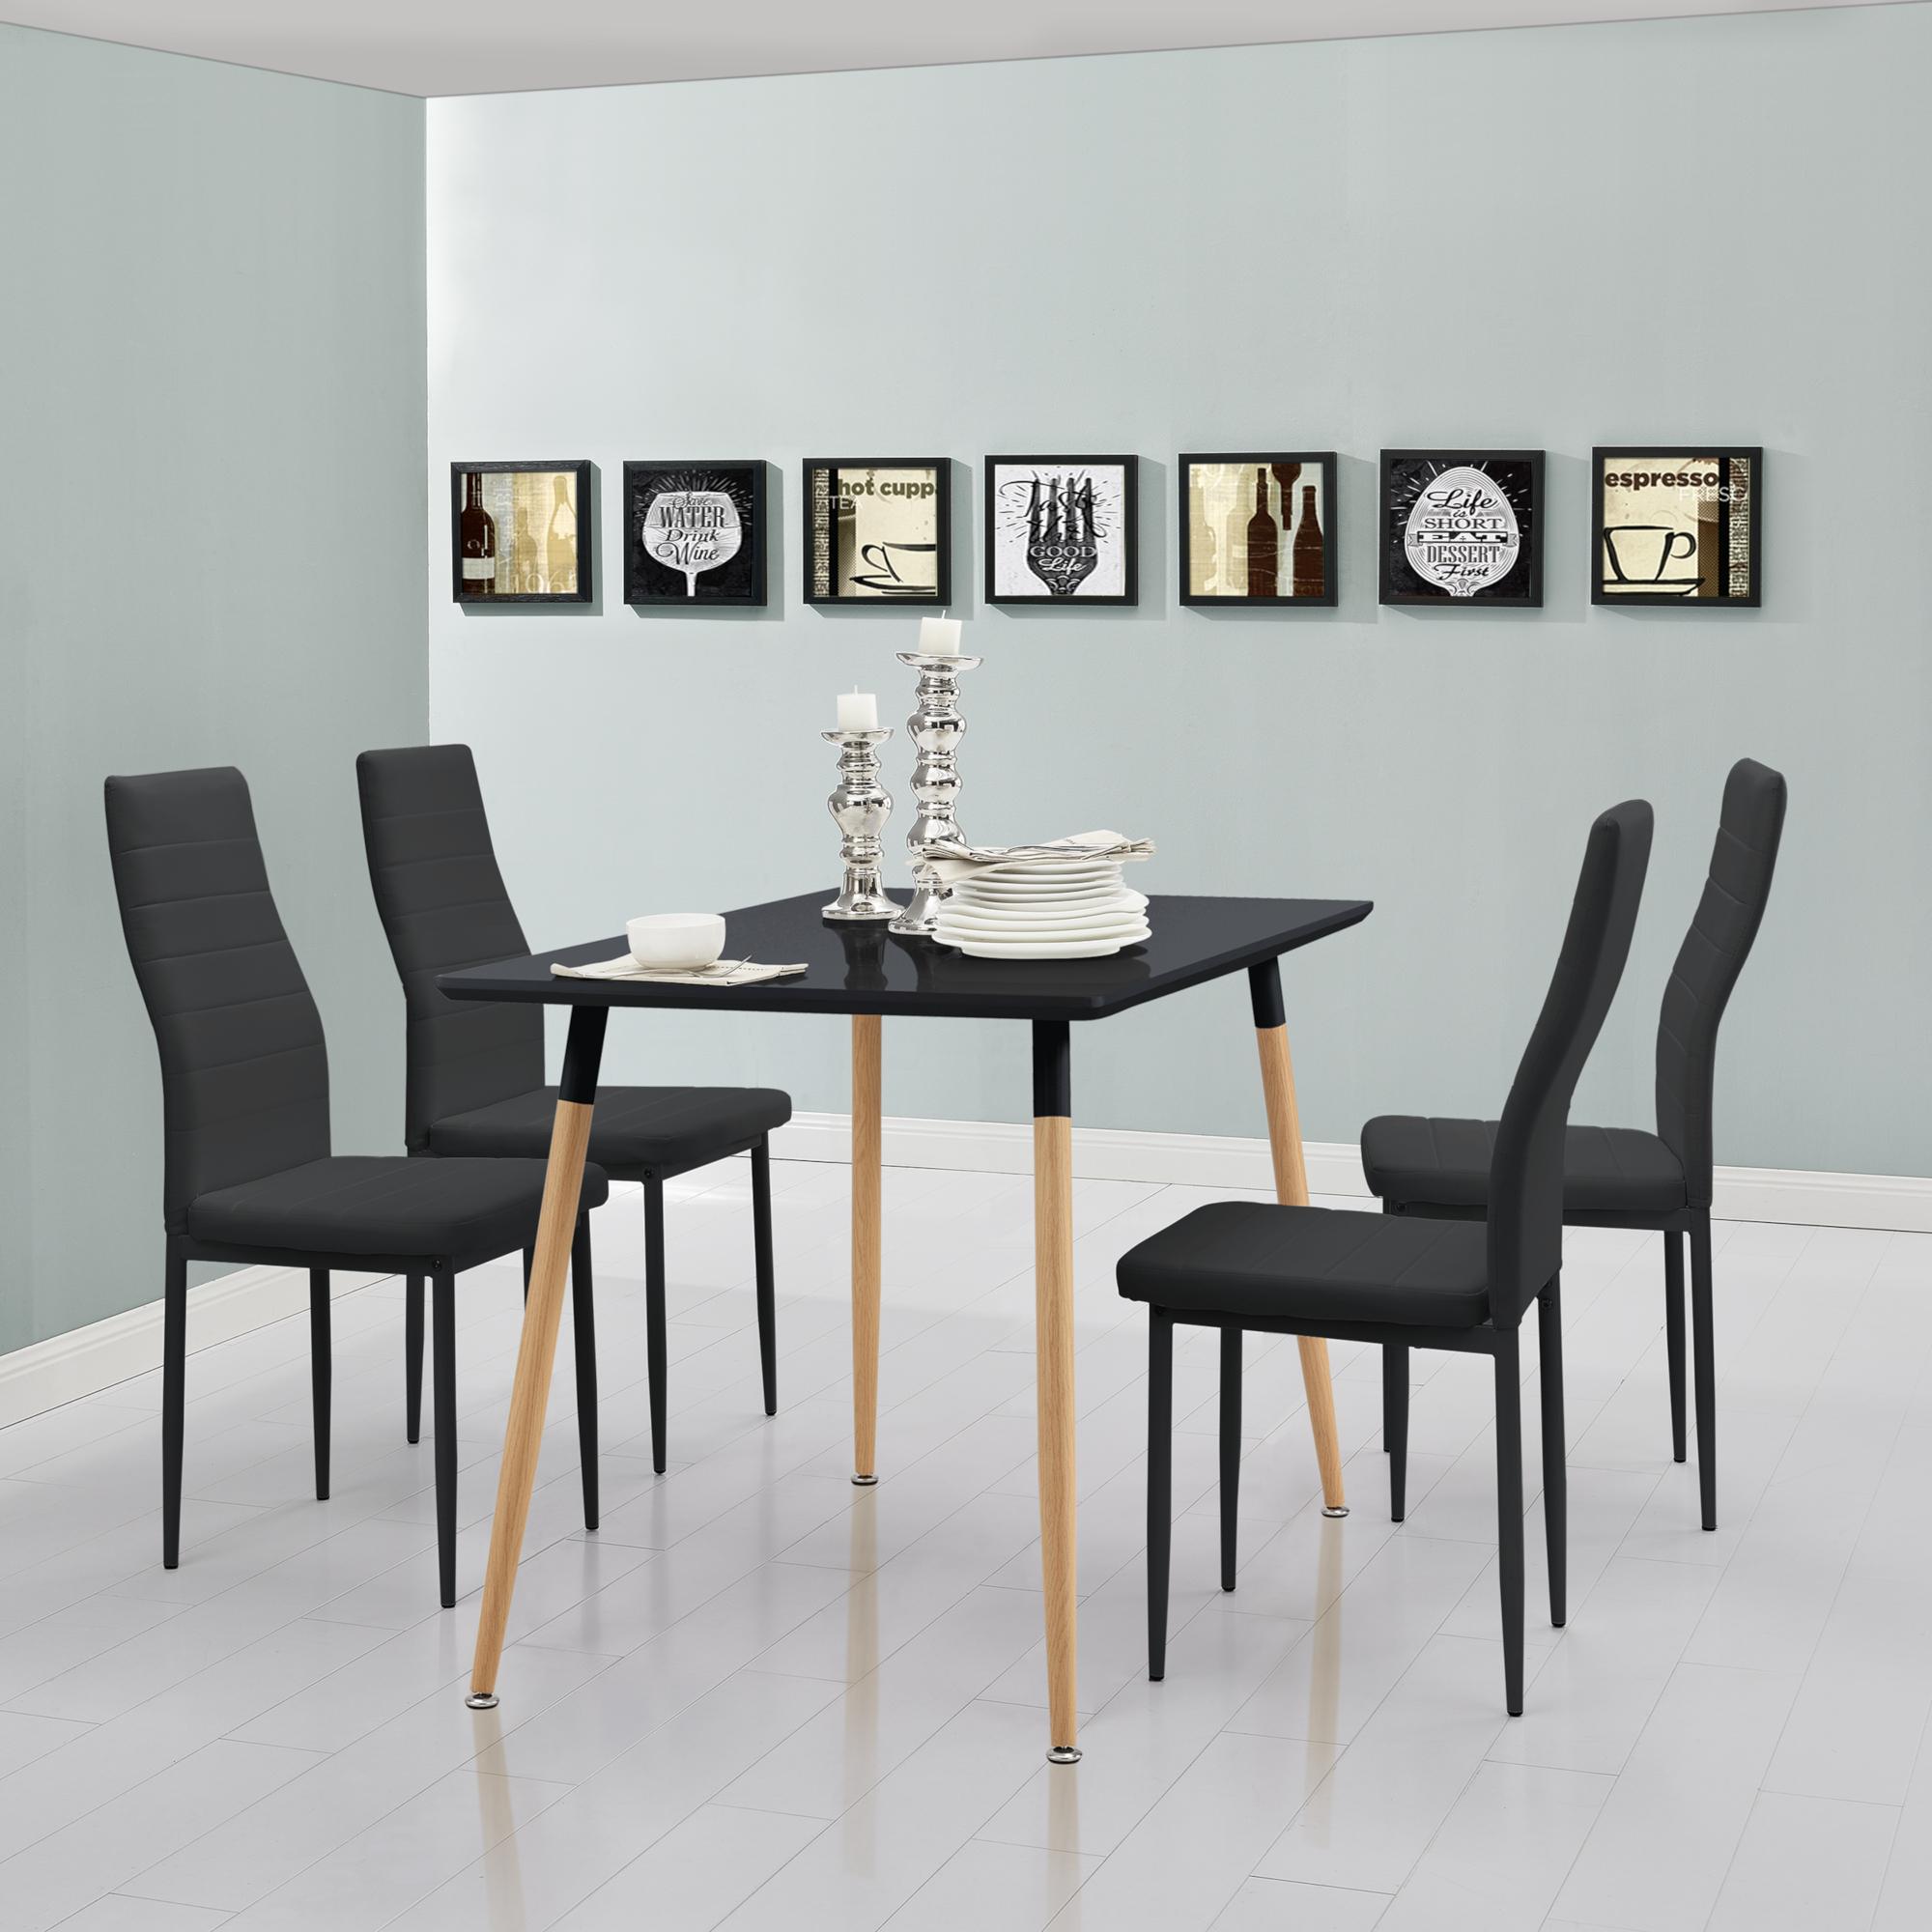 Dettagli su [en.casa]® Tavolo da pranzo con 4 sedie nere/grigio 120x70  tavolo cucina sala